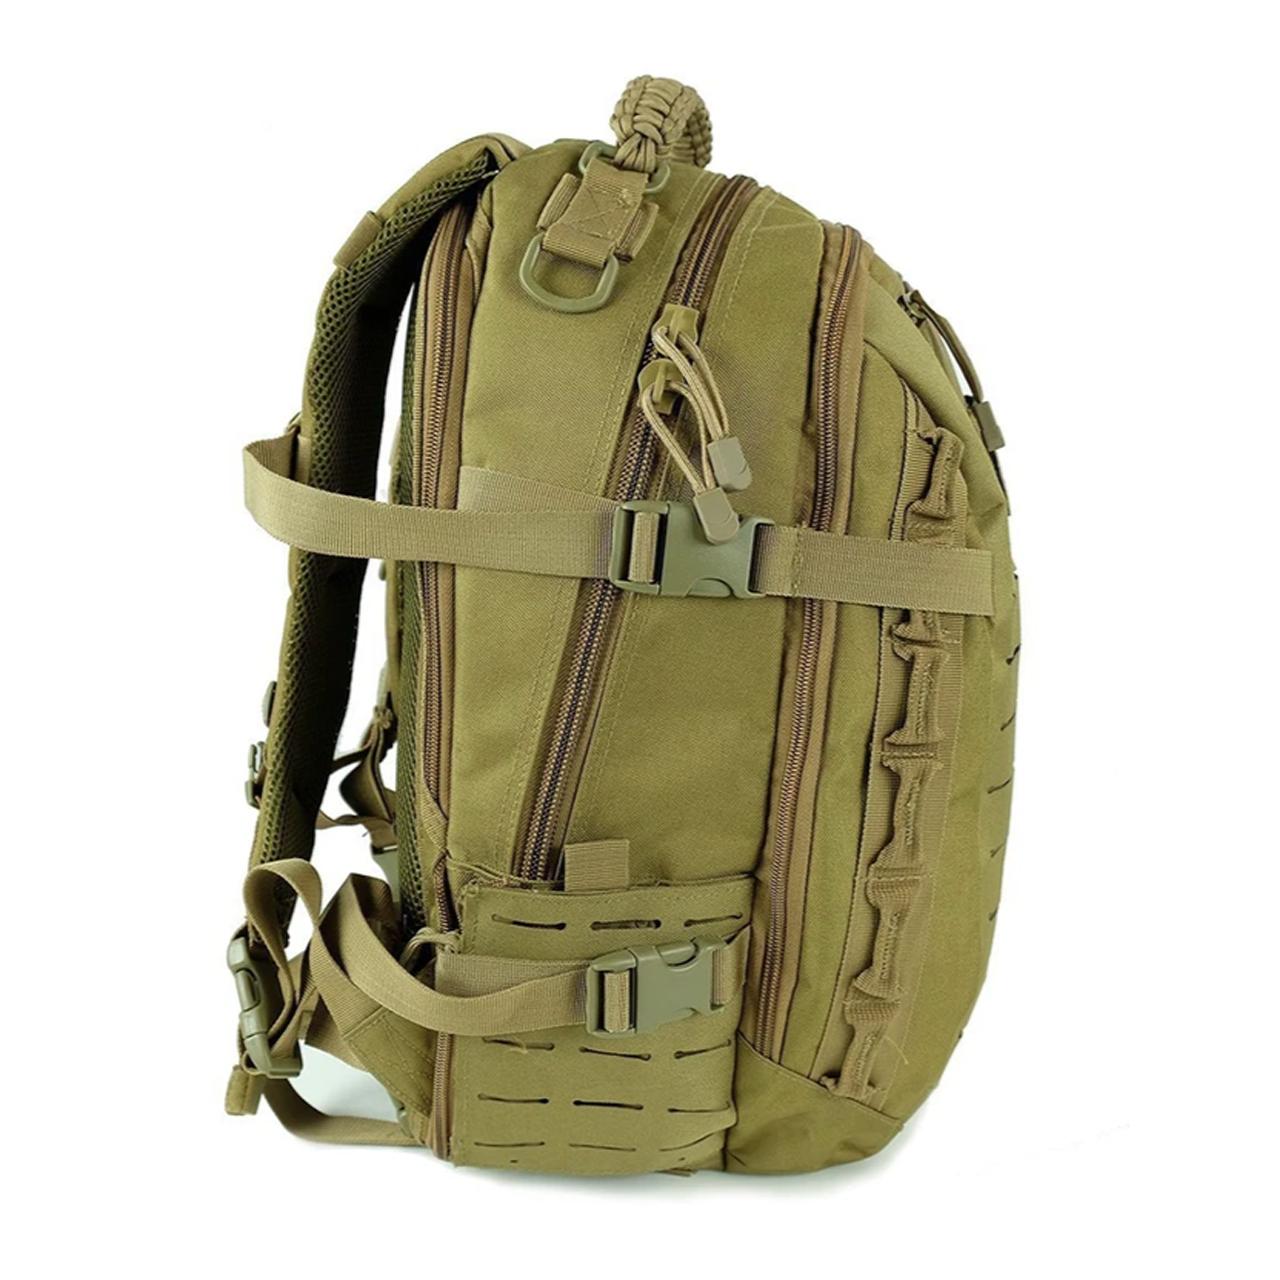 Best value tactical backpack   Compact Outdoor Military Backpack School Bag Trekking Rucksack